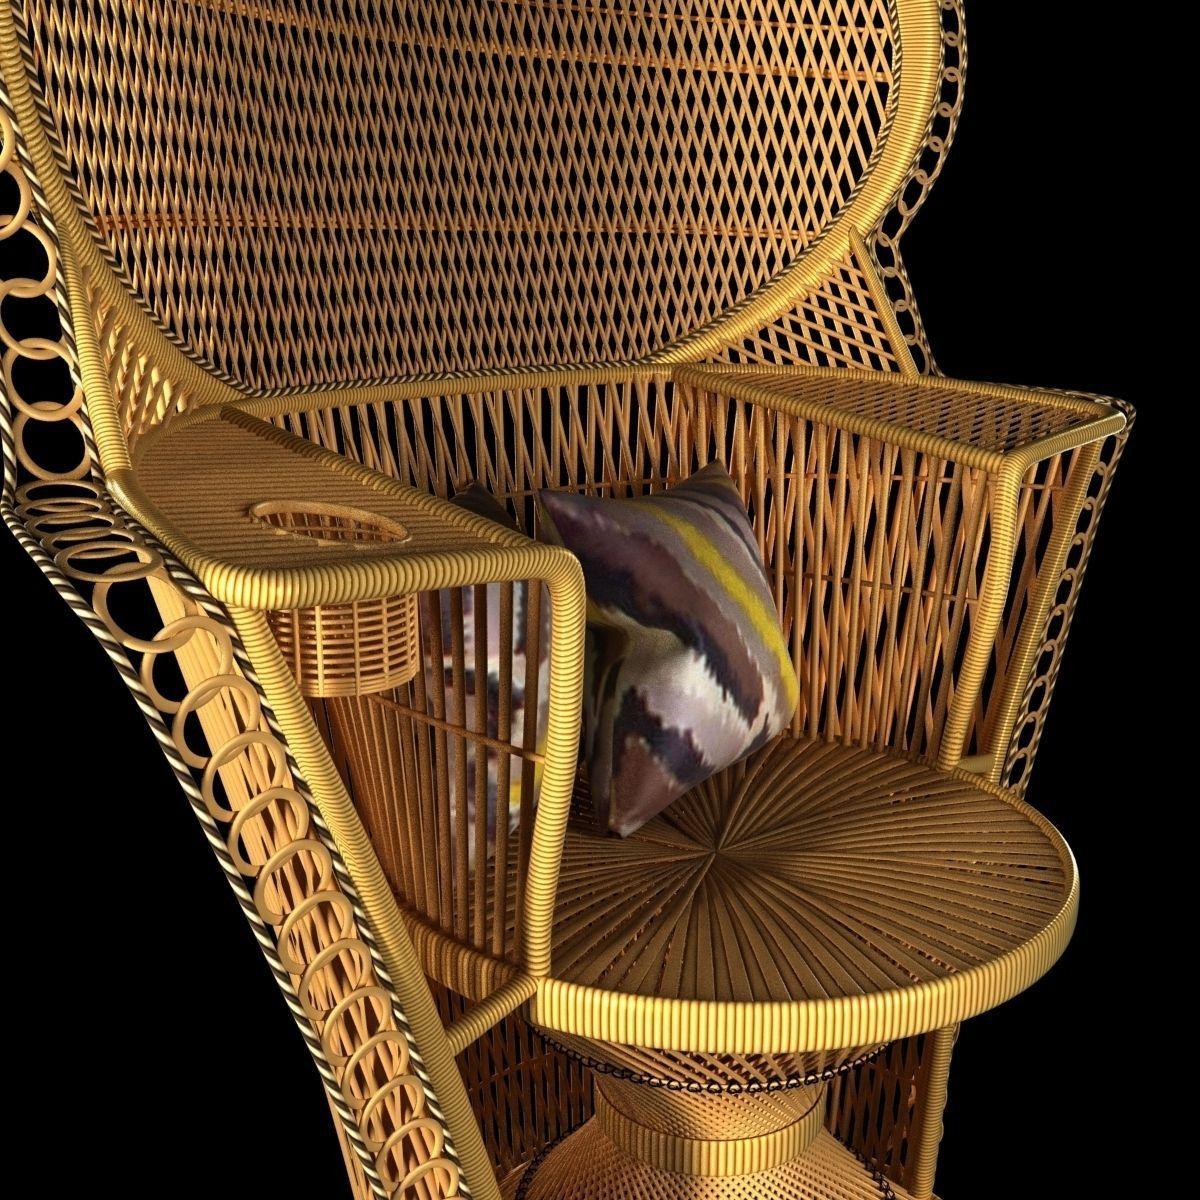 Vintage rattan chair -  Wicker Rattan Fan Back Peacock Chair Vintage 3d Model Max Obj 3ds Fbx Mtl 6